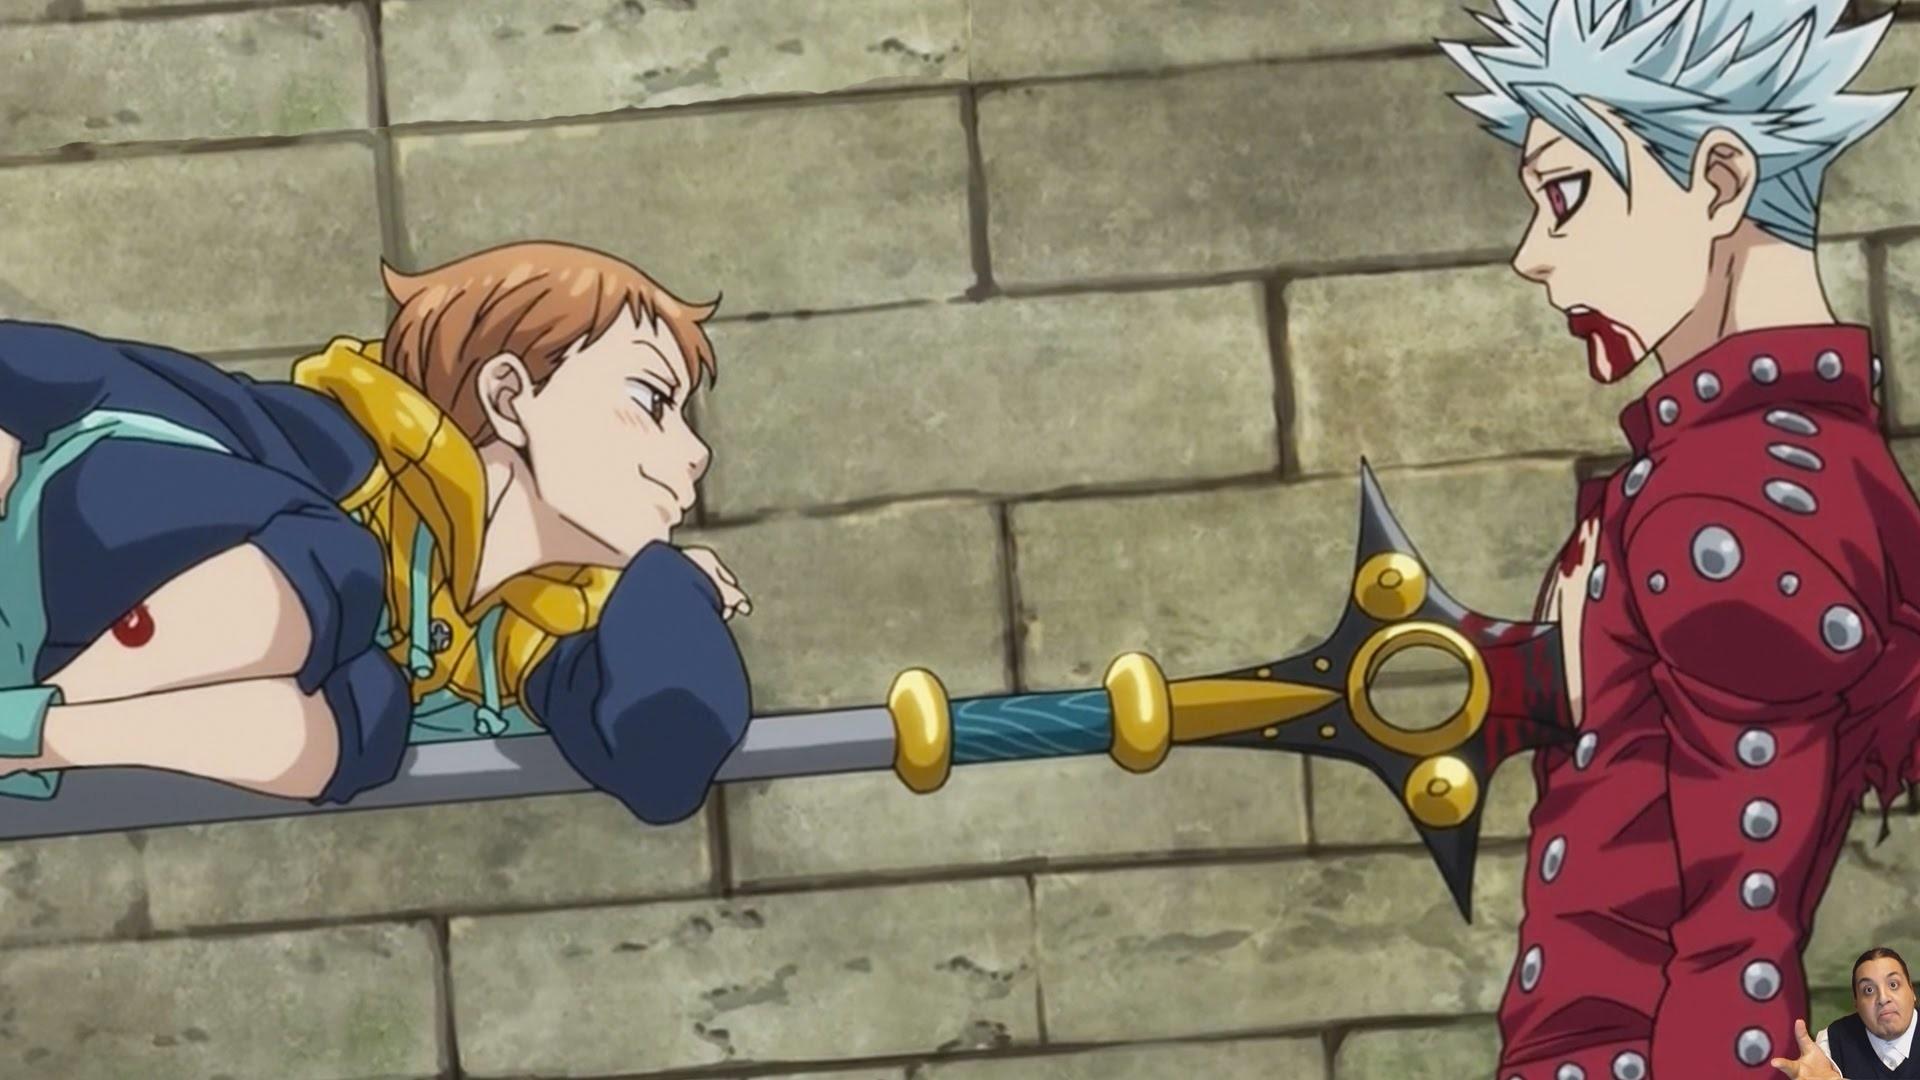 The Seven Deadly Sins Episode 7 & 6 七つの大罪 – Nanatsu No Taizai – Anime  Review – Ban Vs King – YouTube